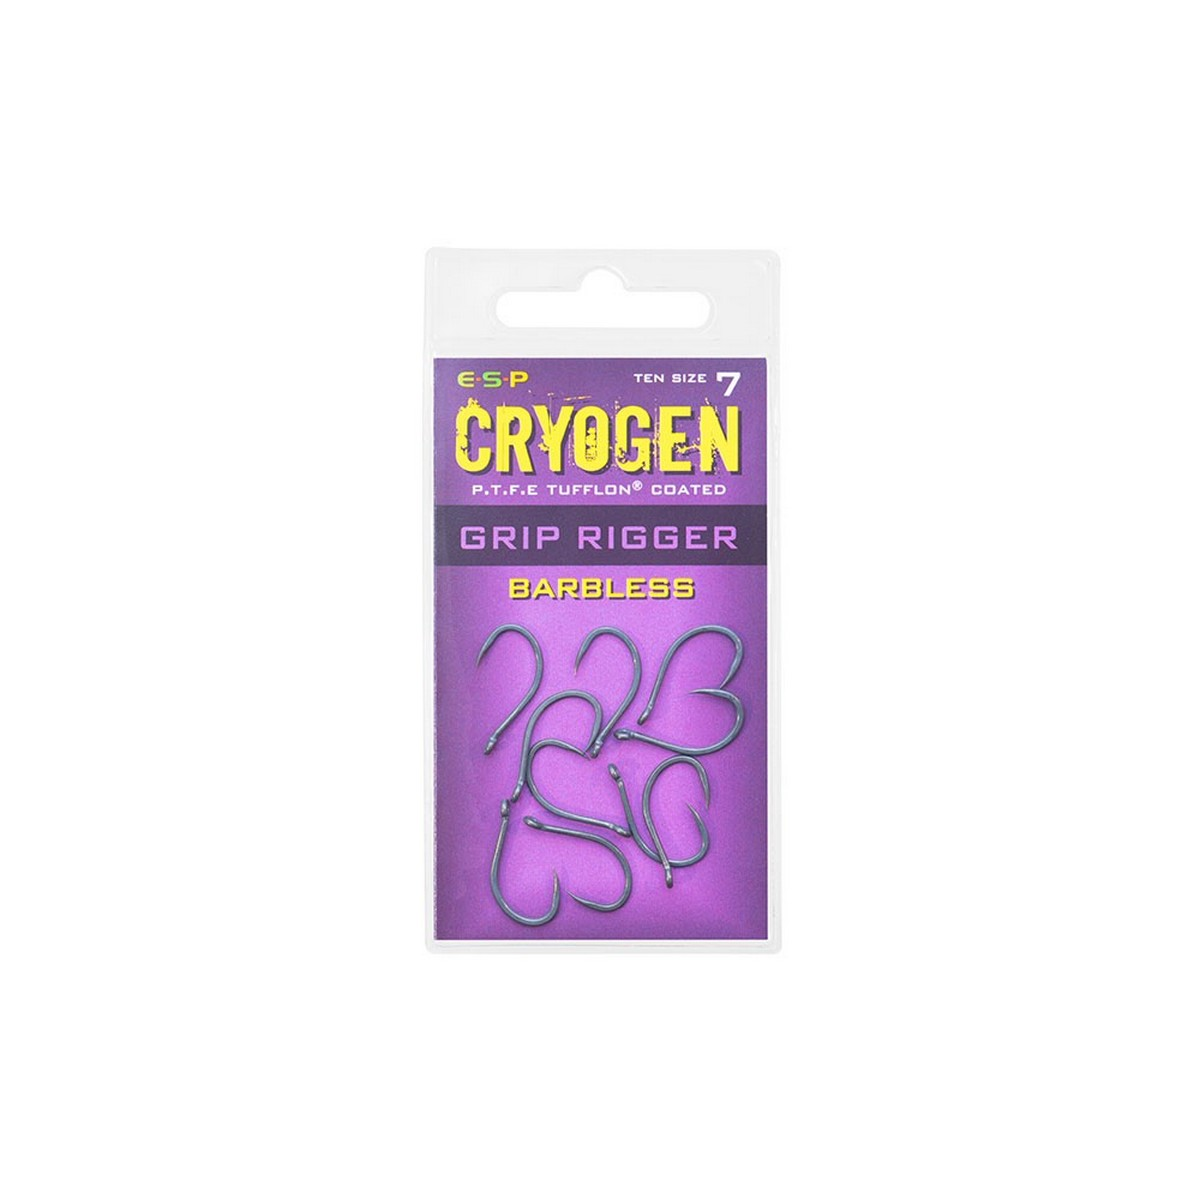 ESP CRYOGEN GRIP RIGGER BS HOROG 7 10DB